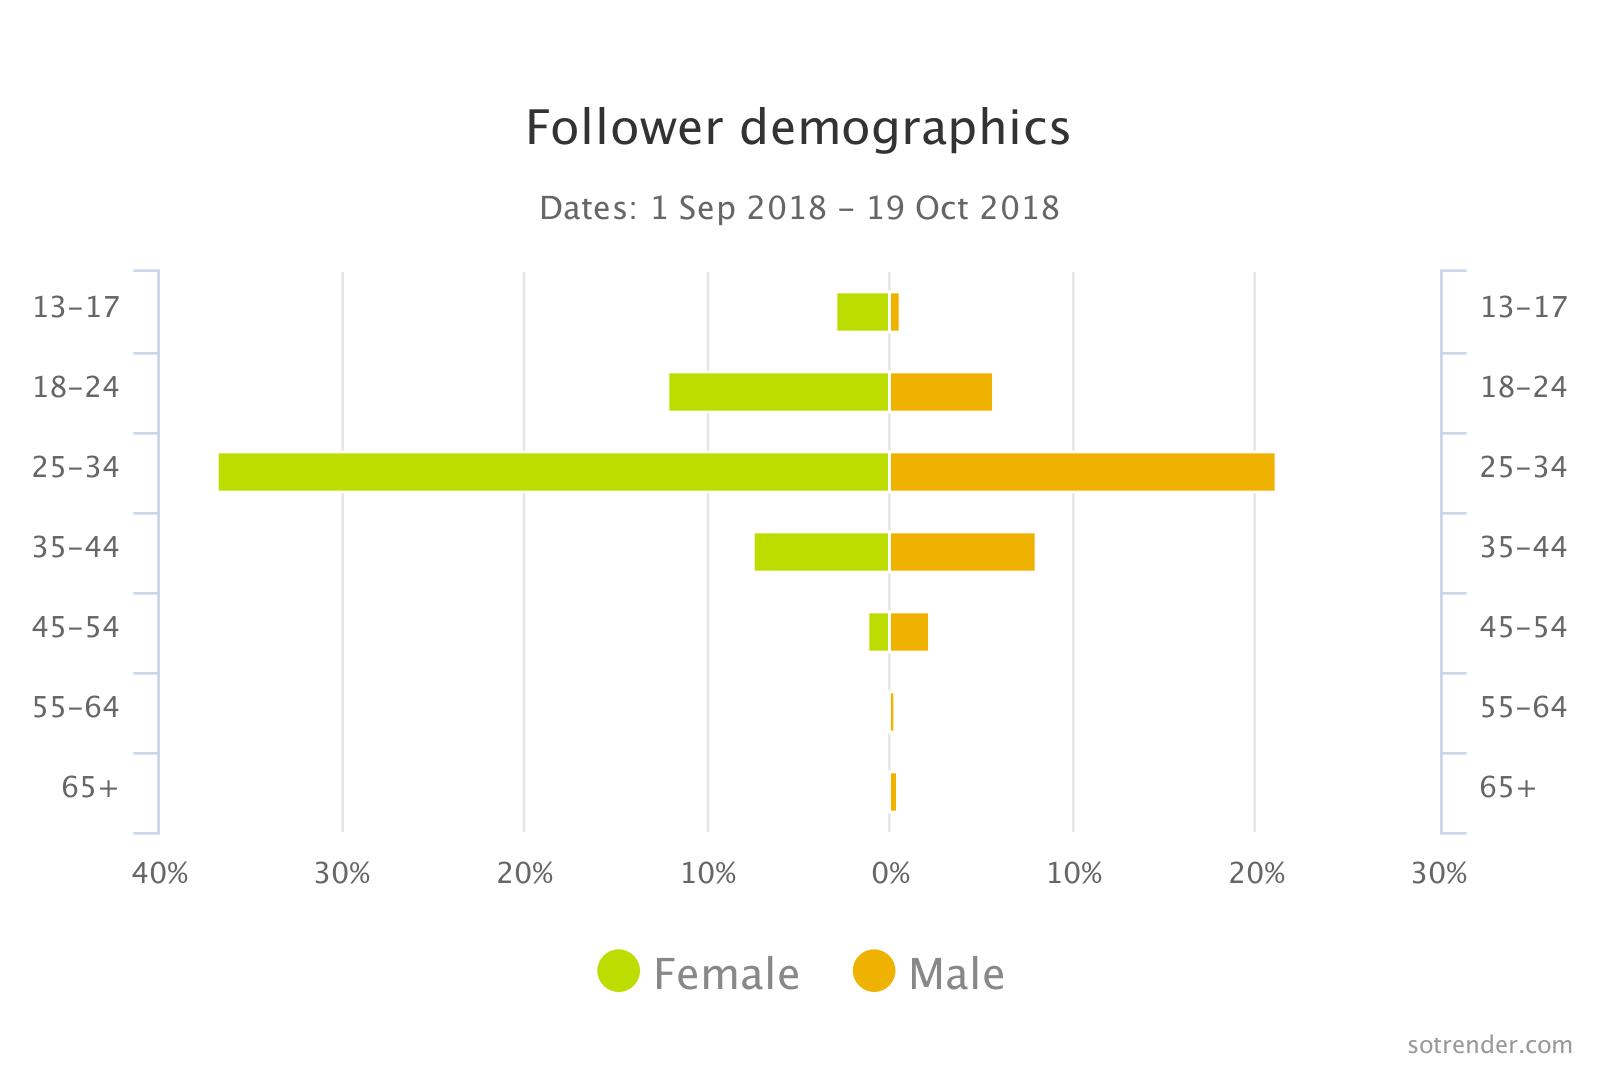 Follower demographic